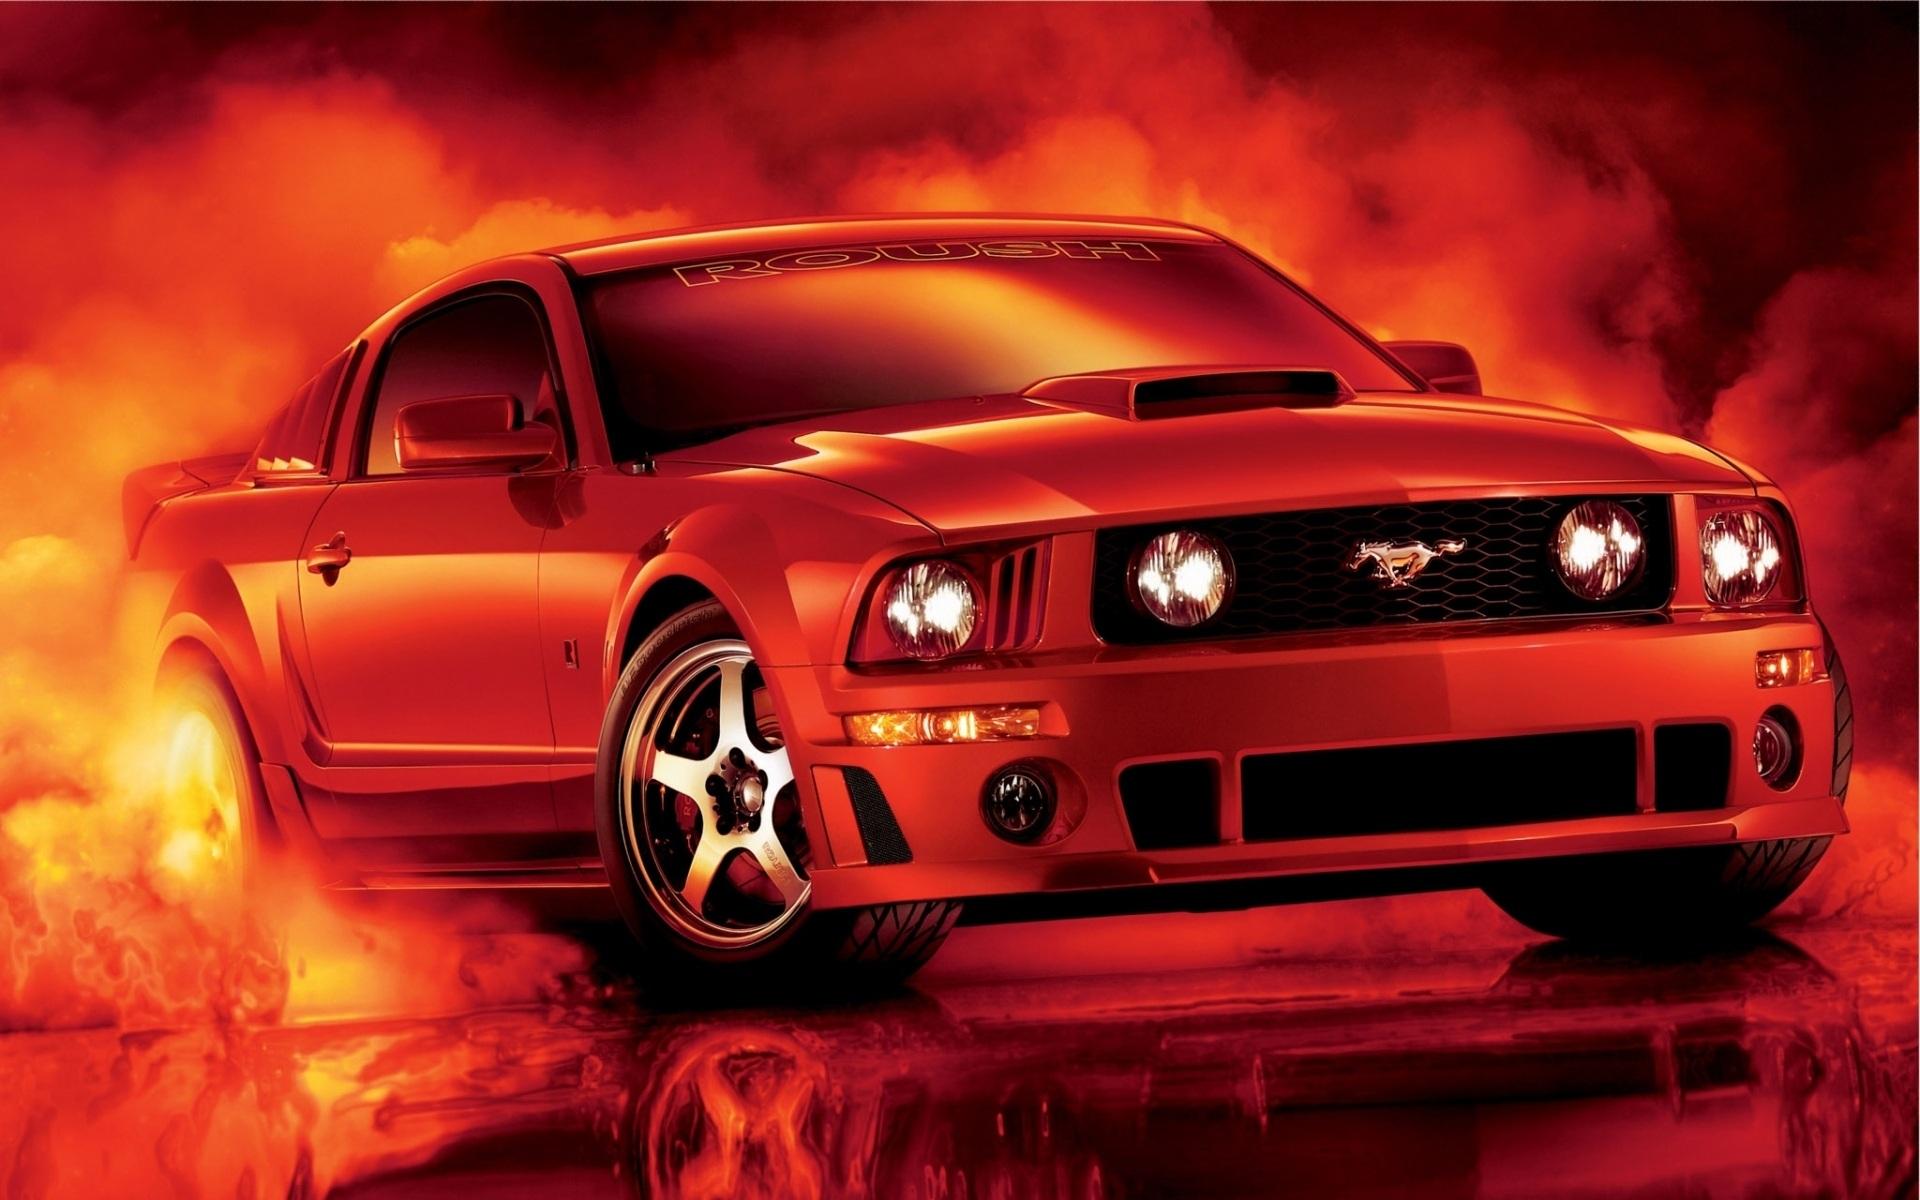 Wallpaper Red Ford mustang car ...